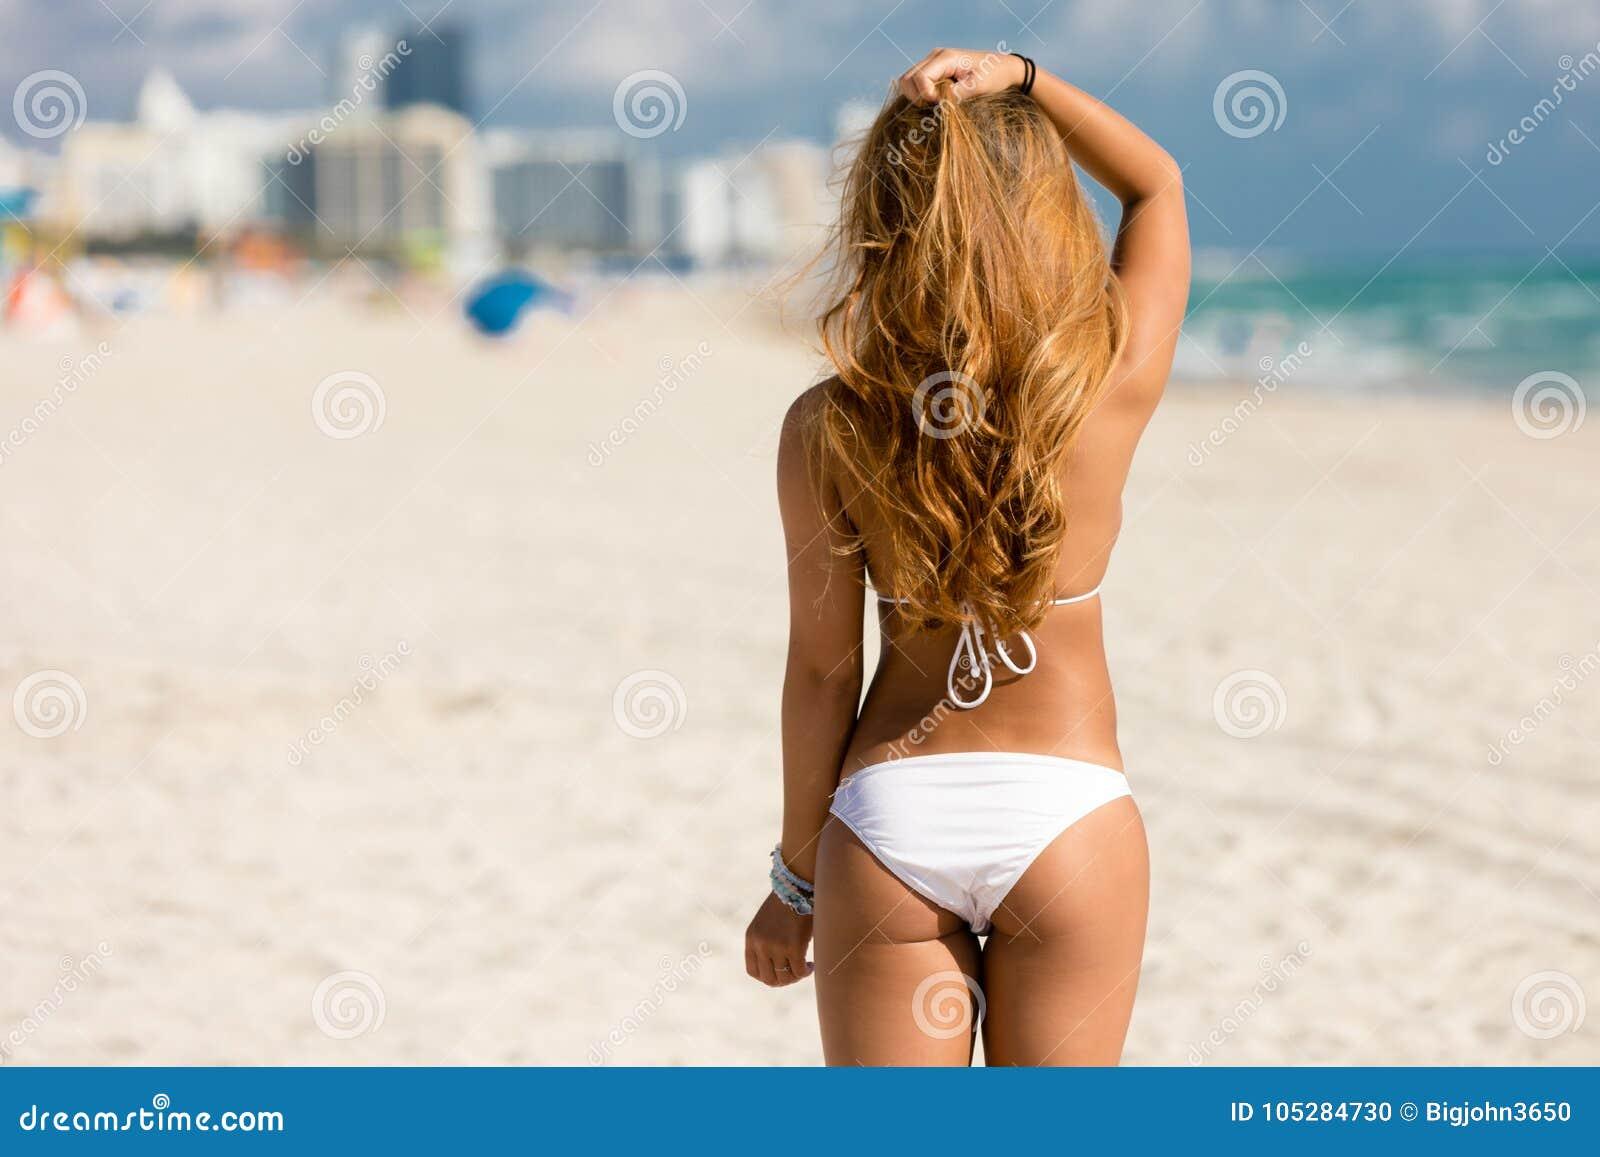 woman in a bikini on beach with back to camera